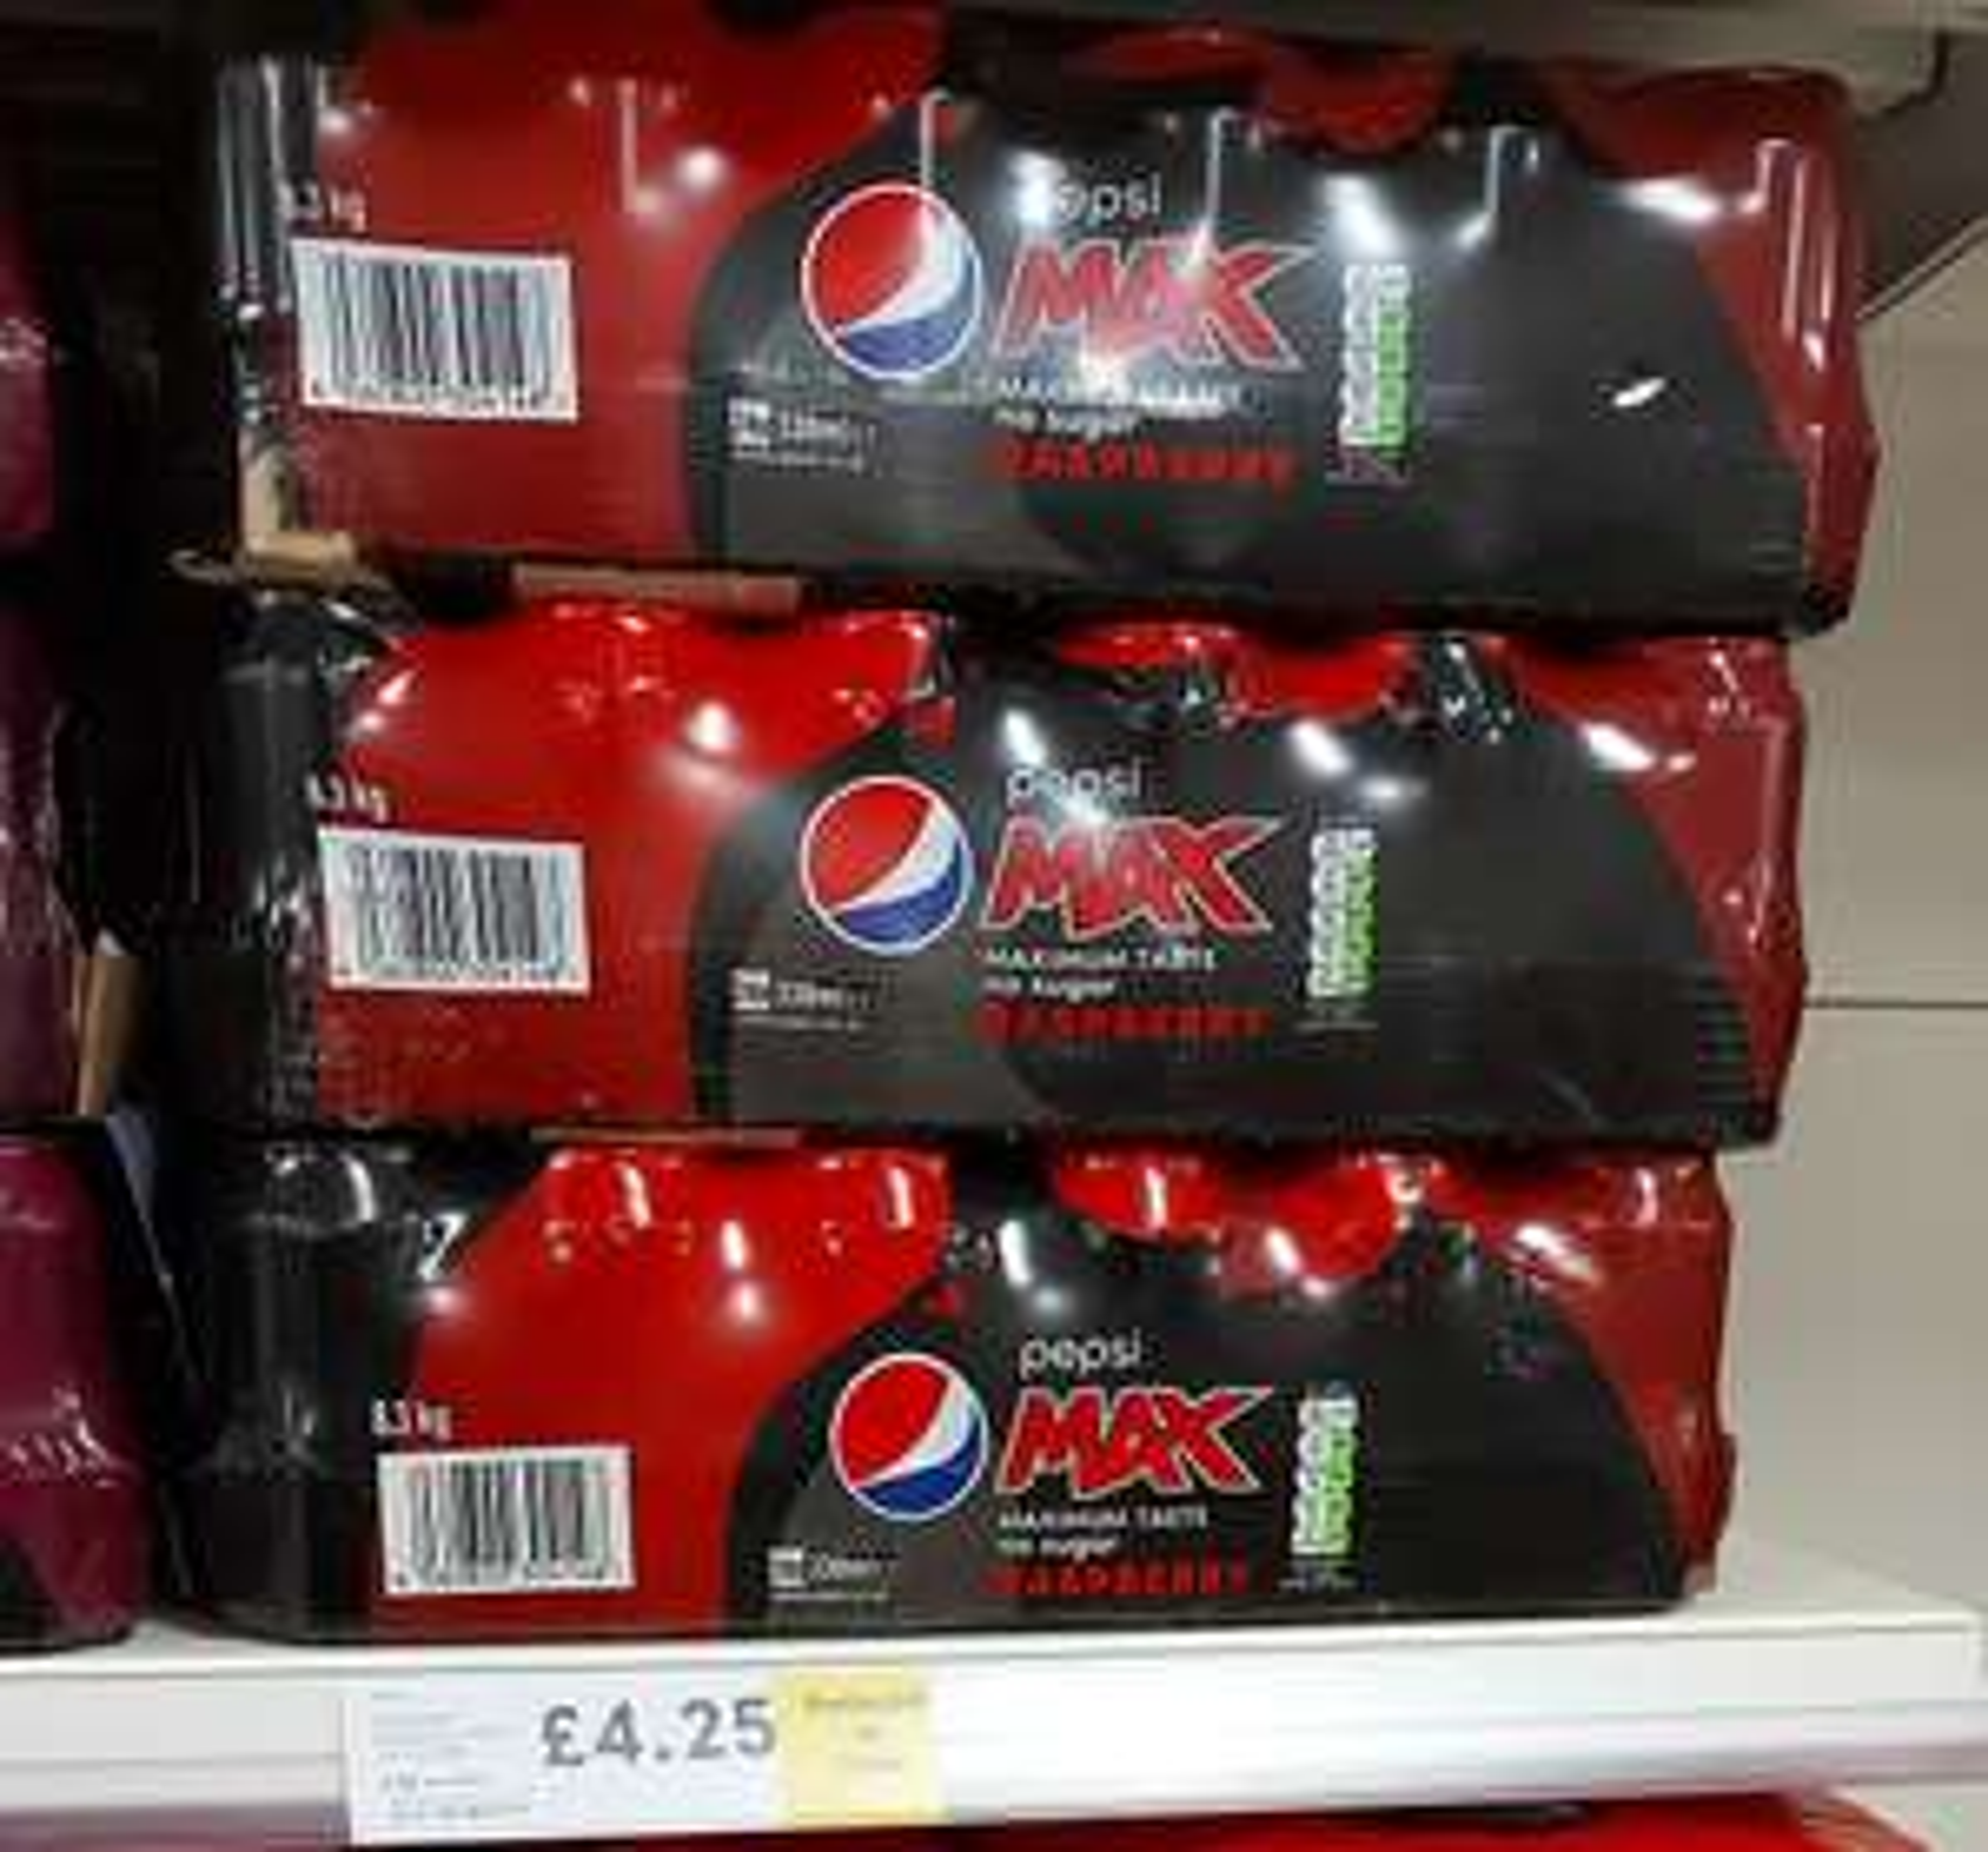 Pepsi Max Raspberry 24pk cans - £4.25 Instore @ Tesco Uddingston